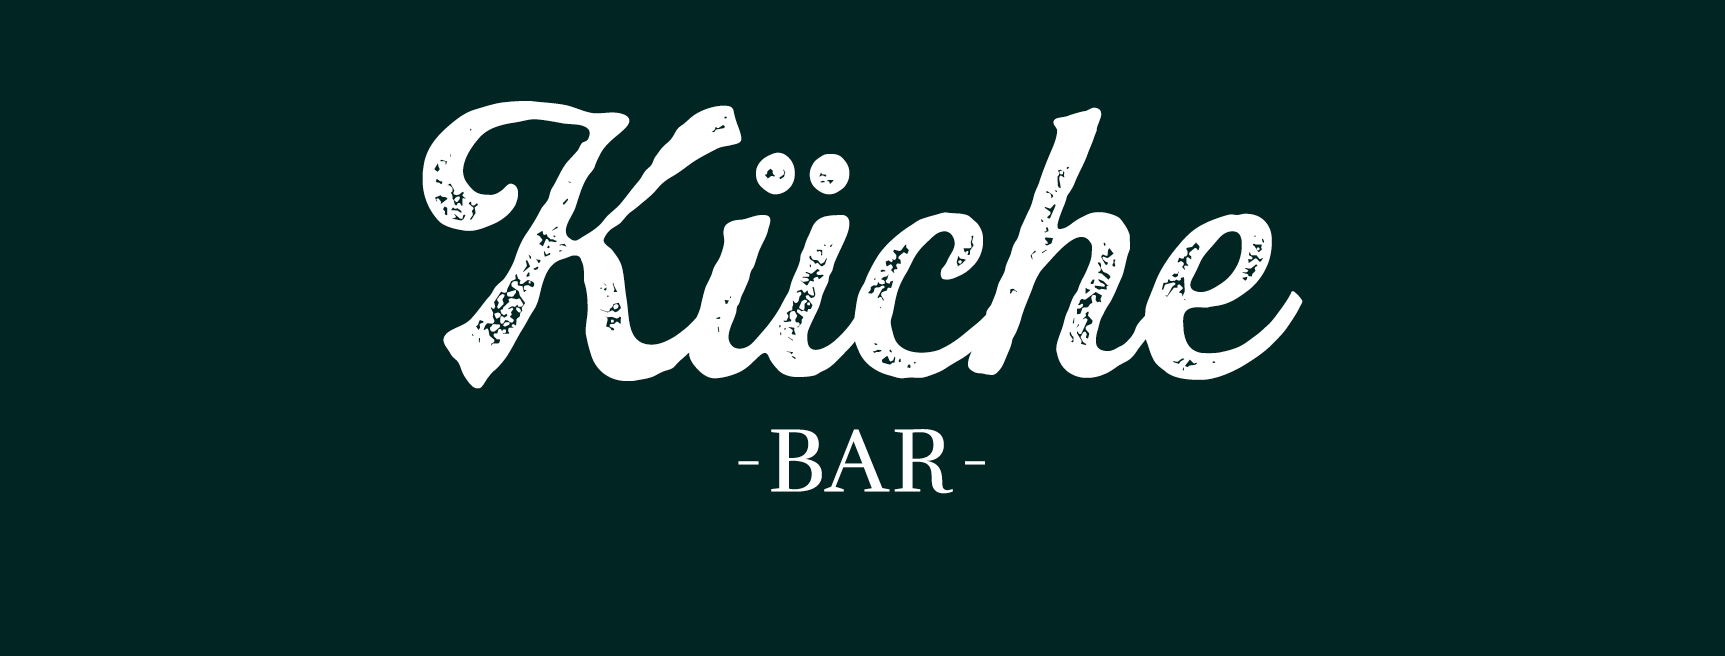 die-kueche-bar